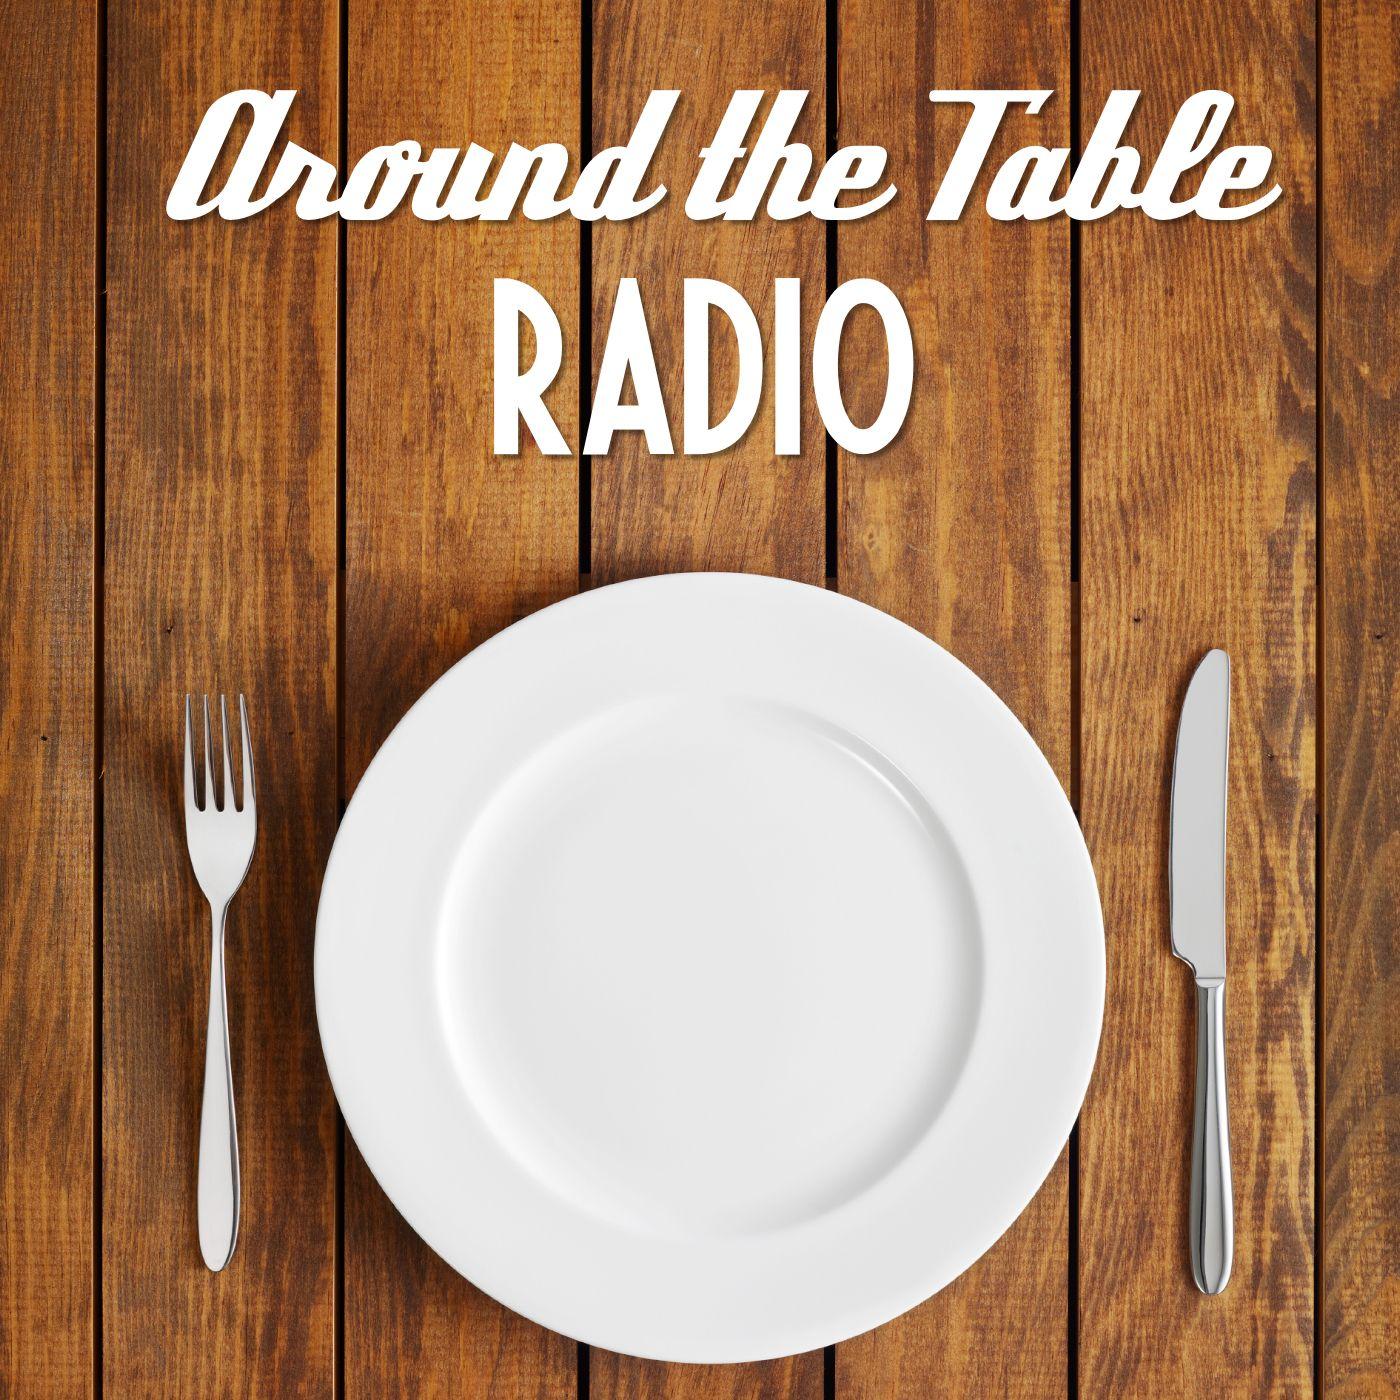 ATT056 - Around the Table with Suzanne Pfefferle